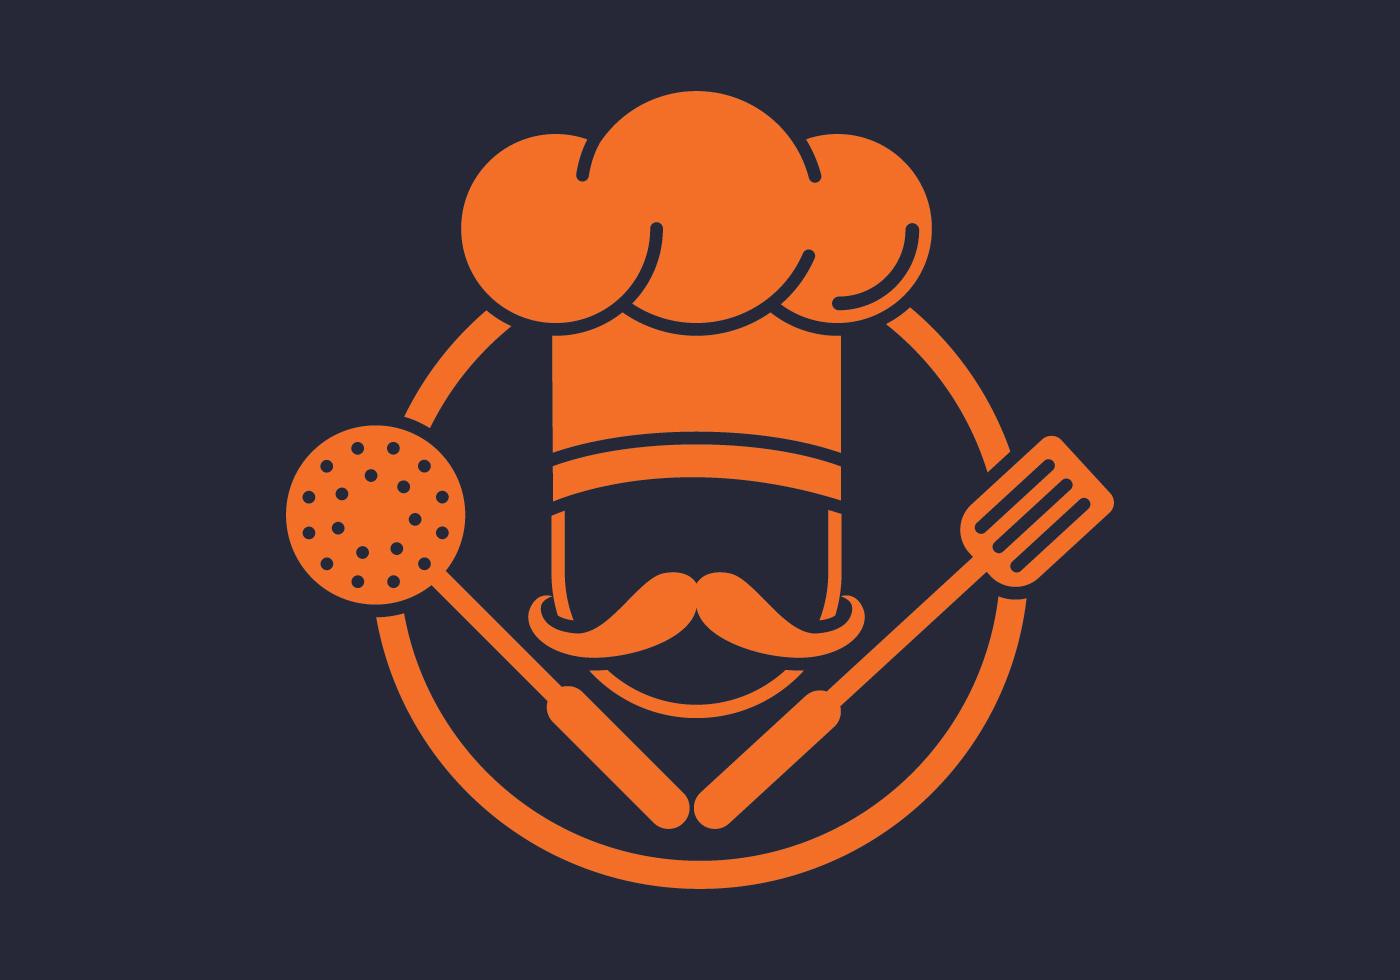 Vetor De Chapeu De Chef Download Vetores Gratis Desenhos De